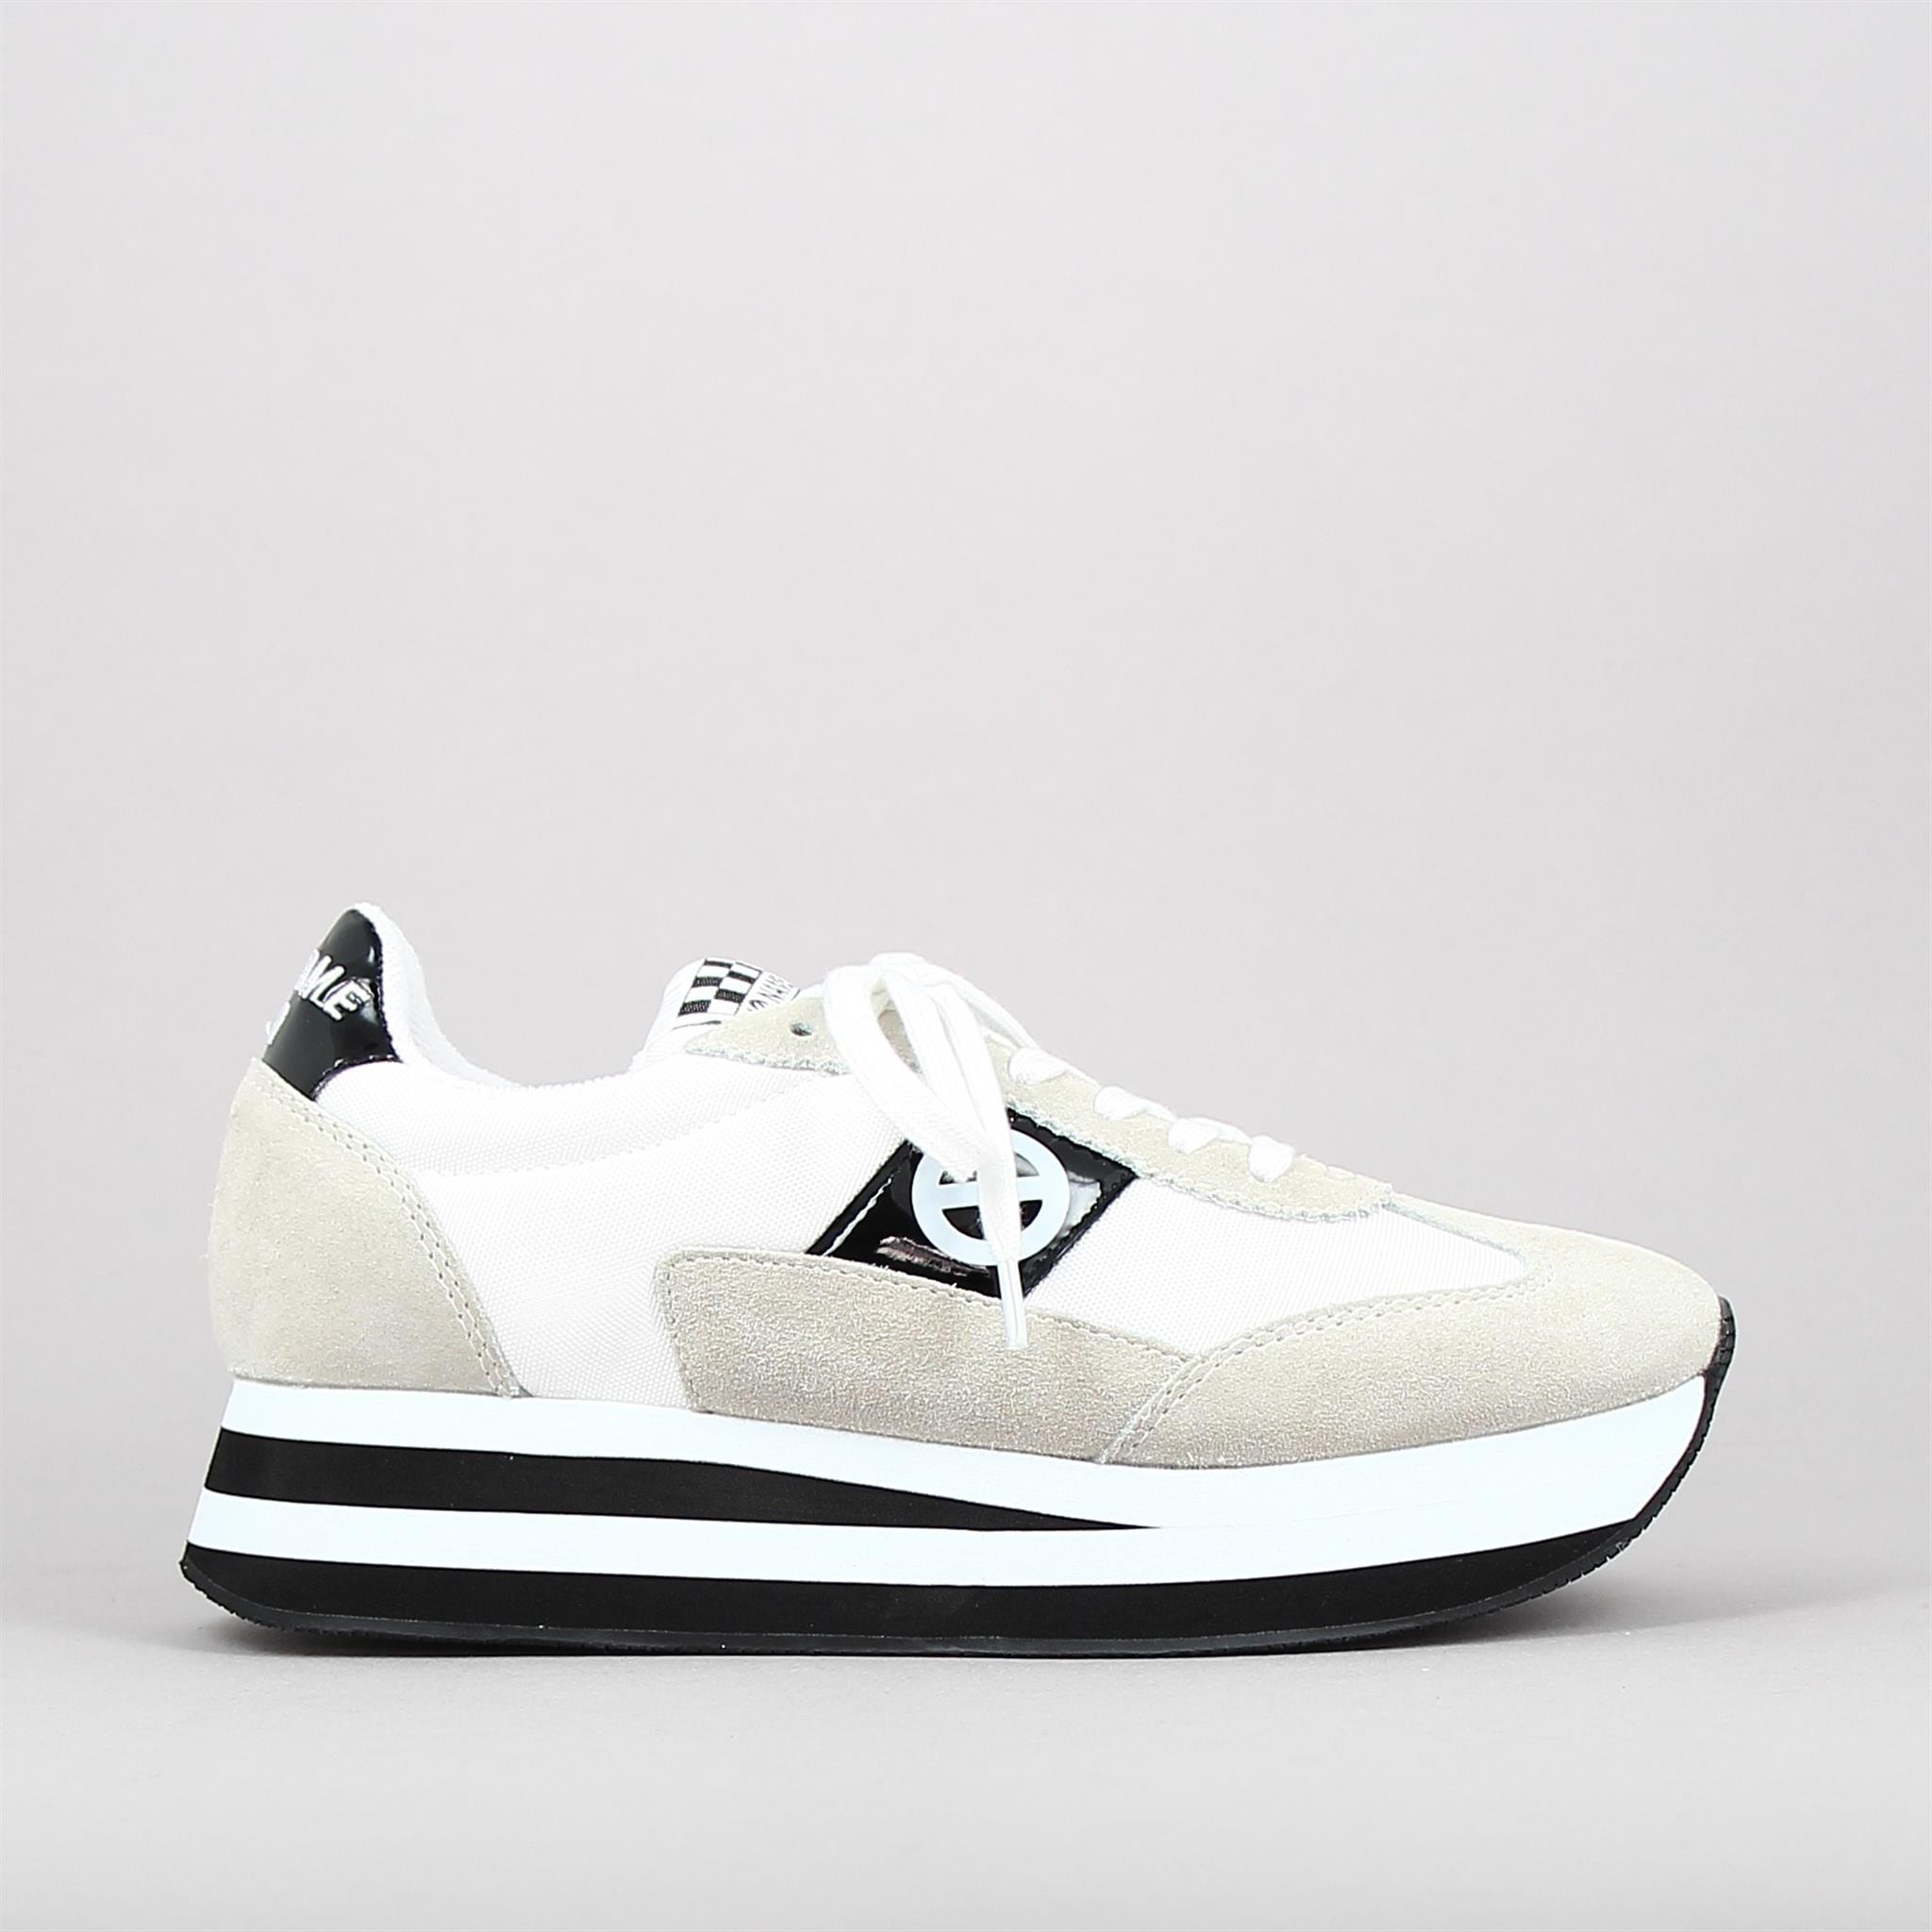 flex-jogger-1819-blanc-159121410-0.jpg